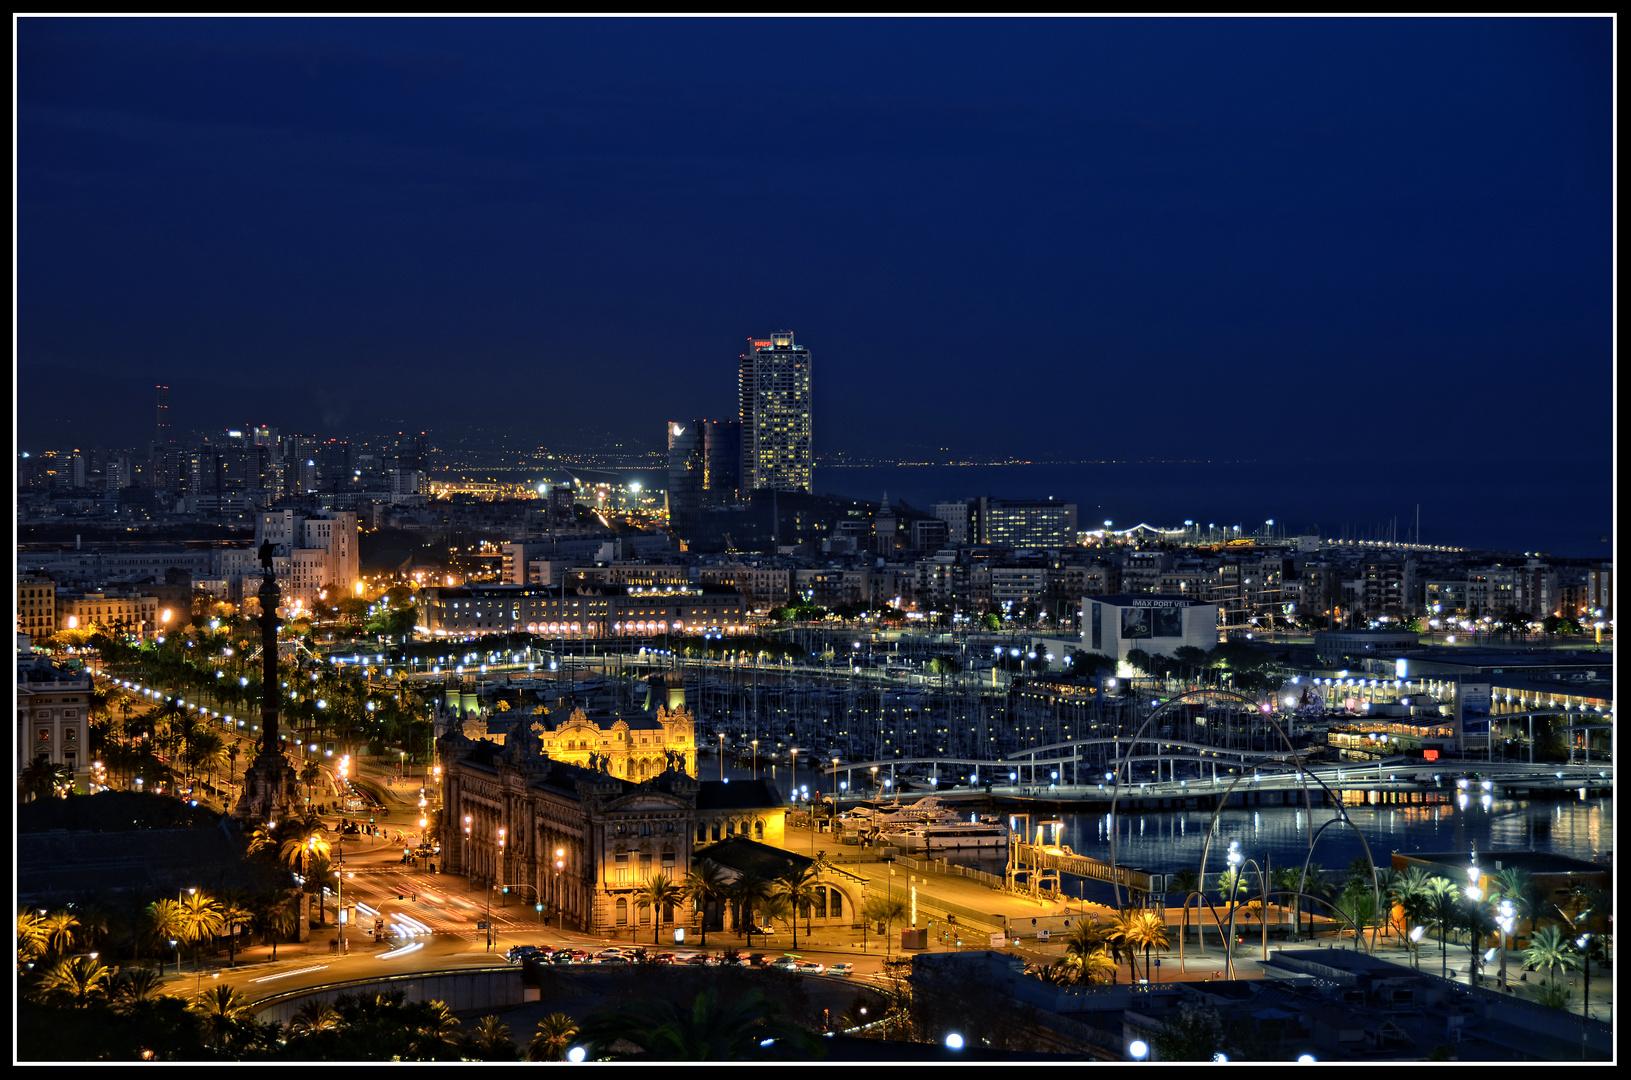 La meva estimada ciutat: Barcelona